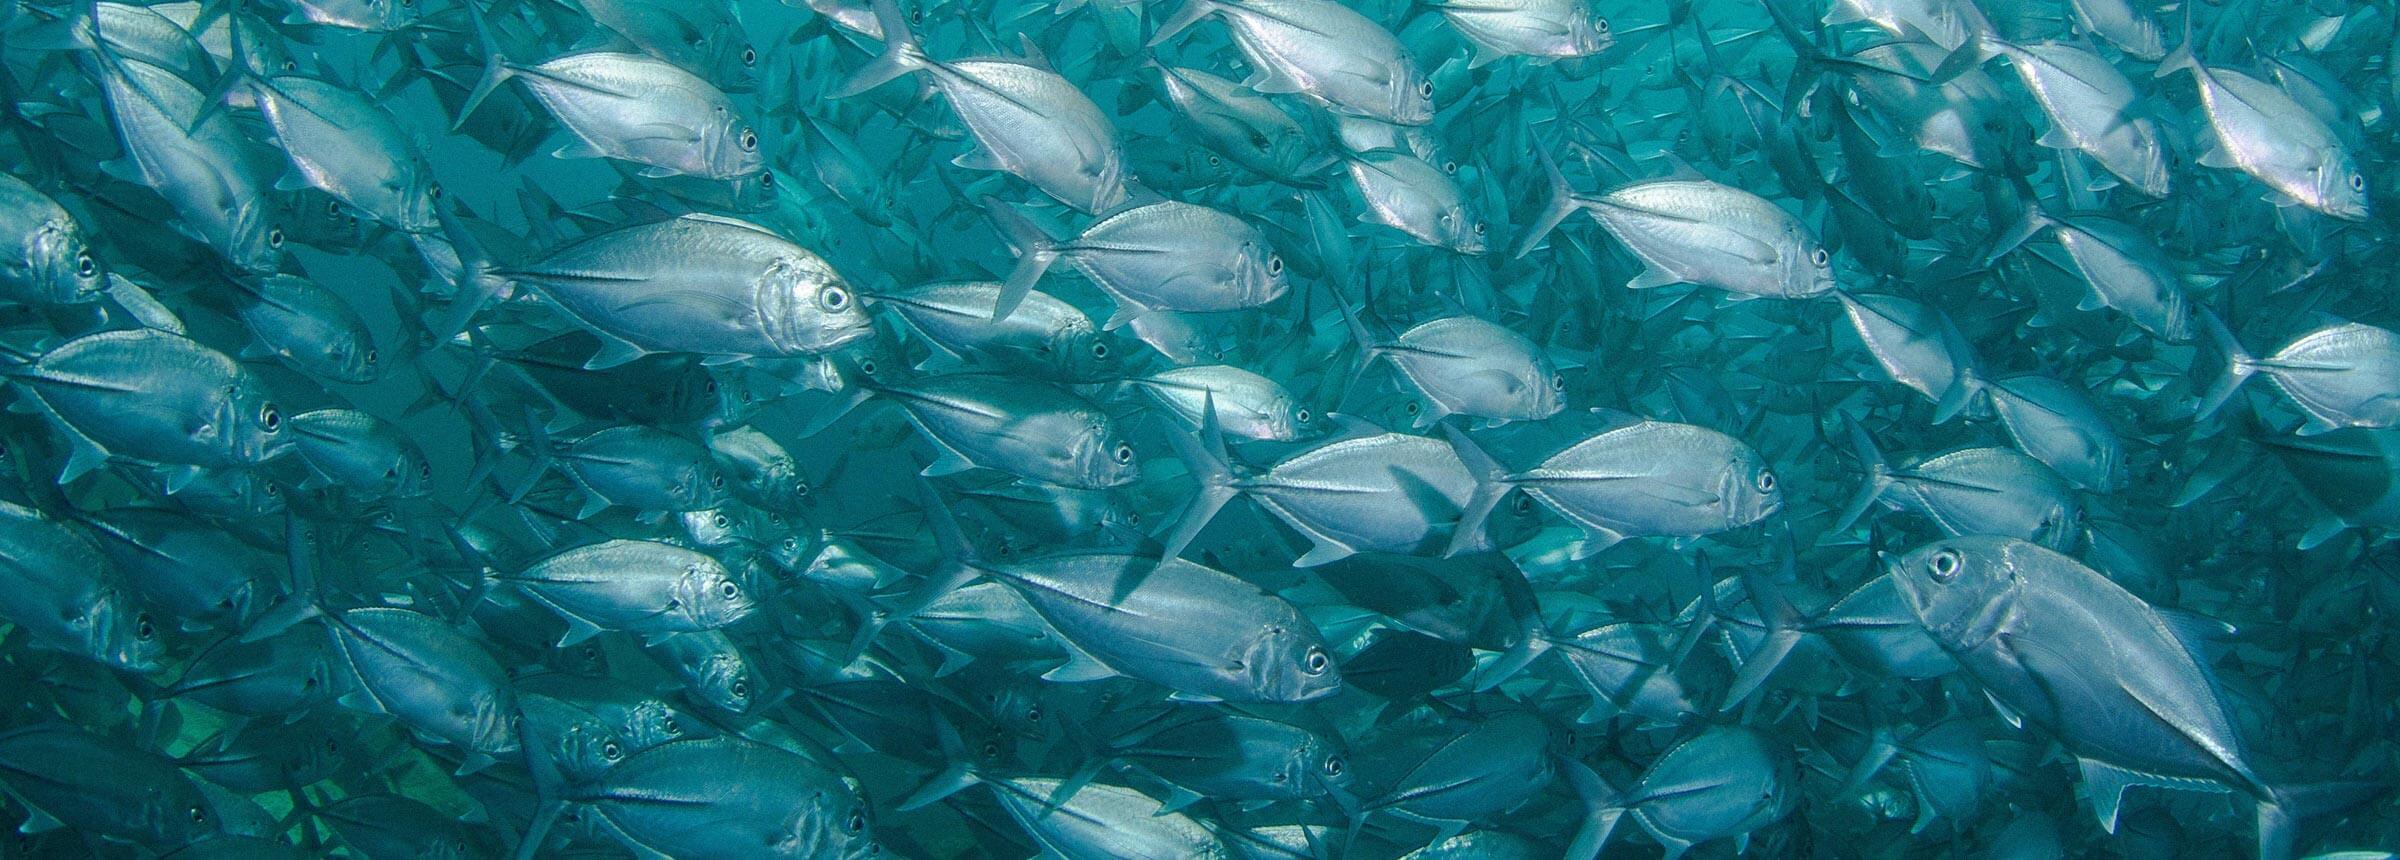 pesca especies vida submarina